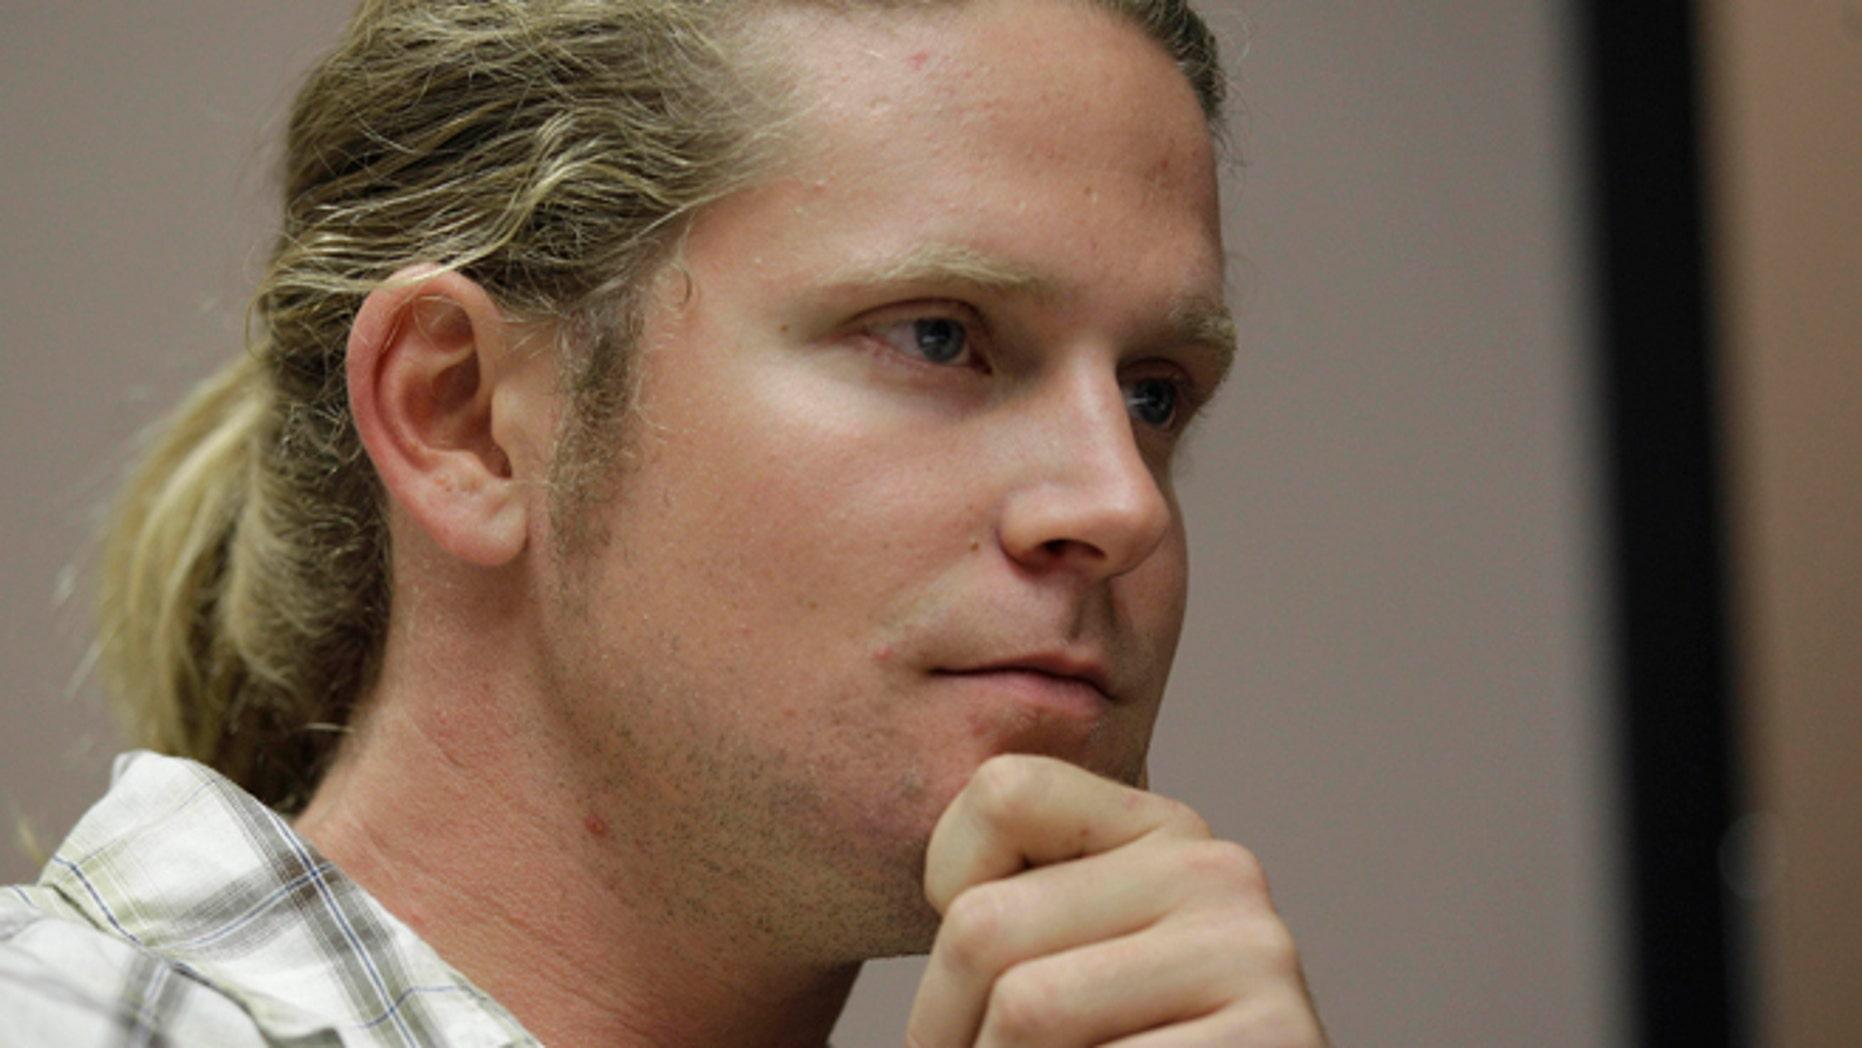 Sept. 4, 2012: James Ian Tyson, of Charlotte, speaks to an Associated Press reporter in Charlotte, N.C.